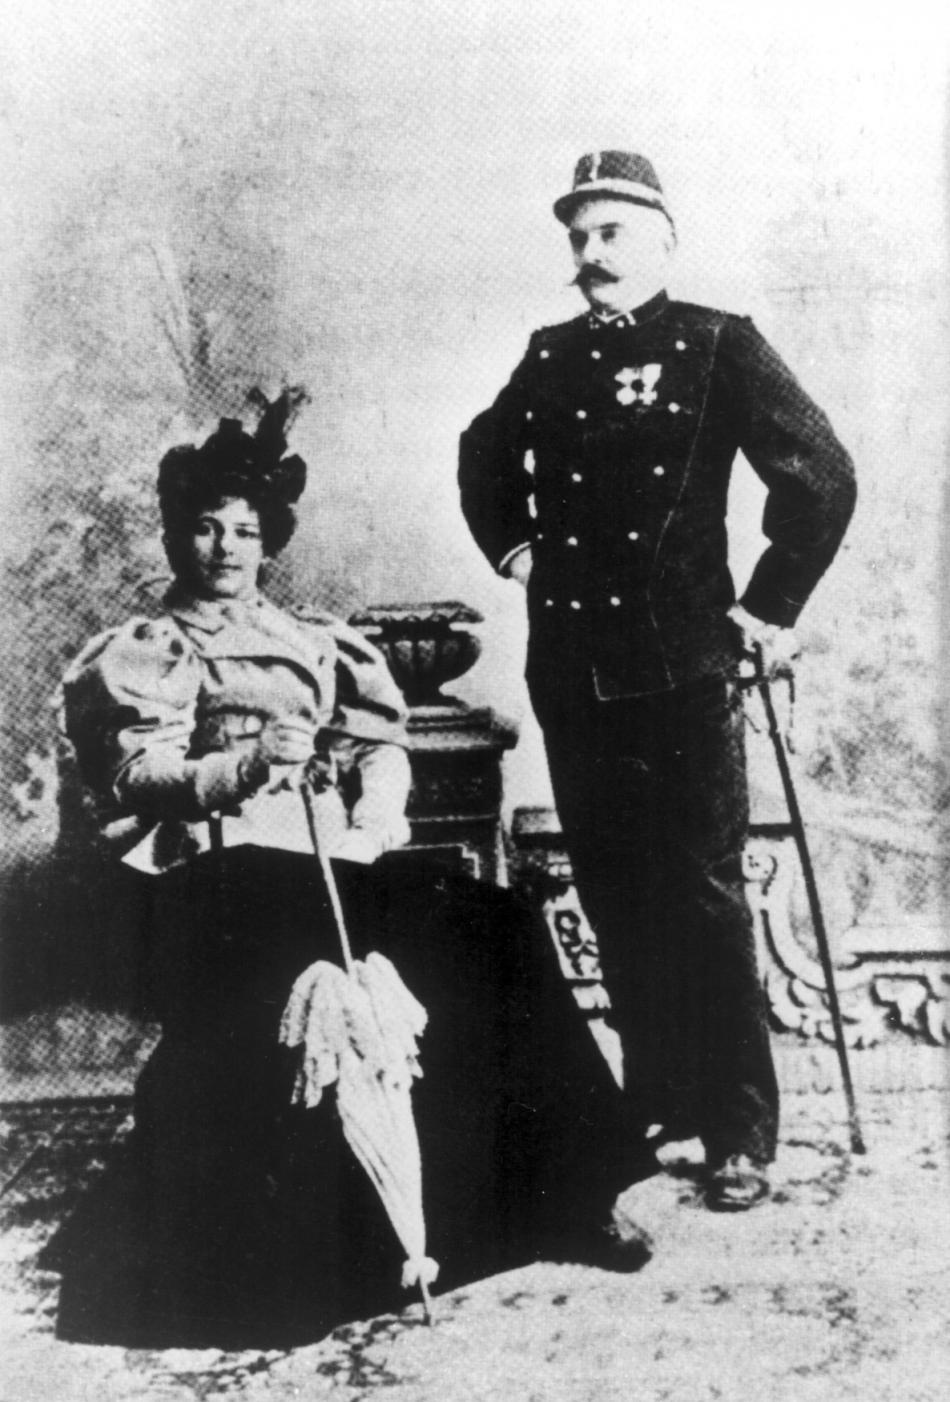 Gretha se svým manželem Rudolfem MacLeodem v roce 1900